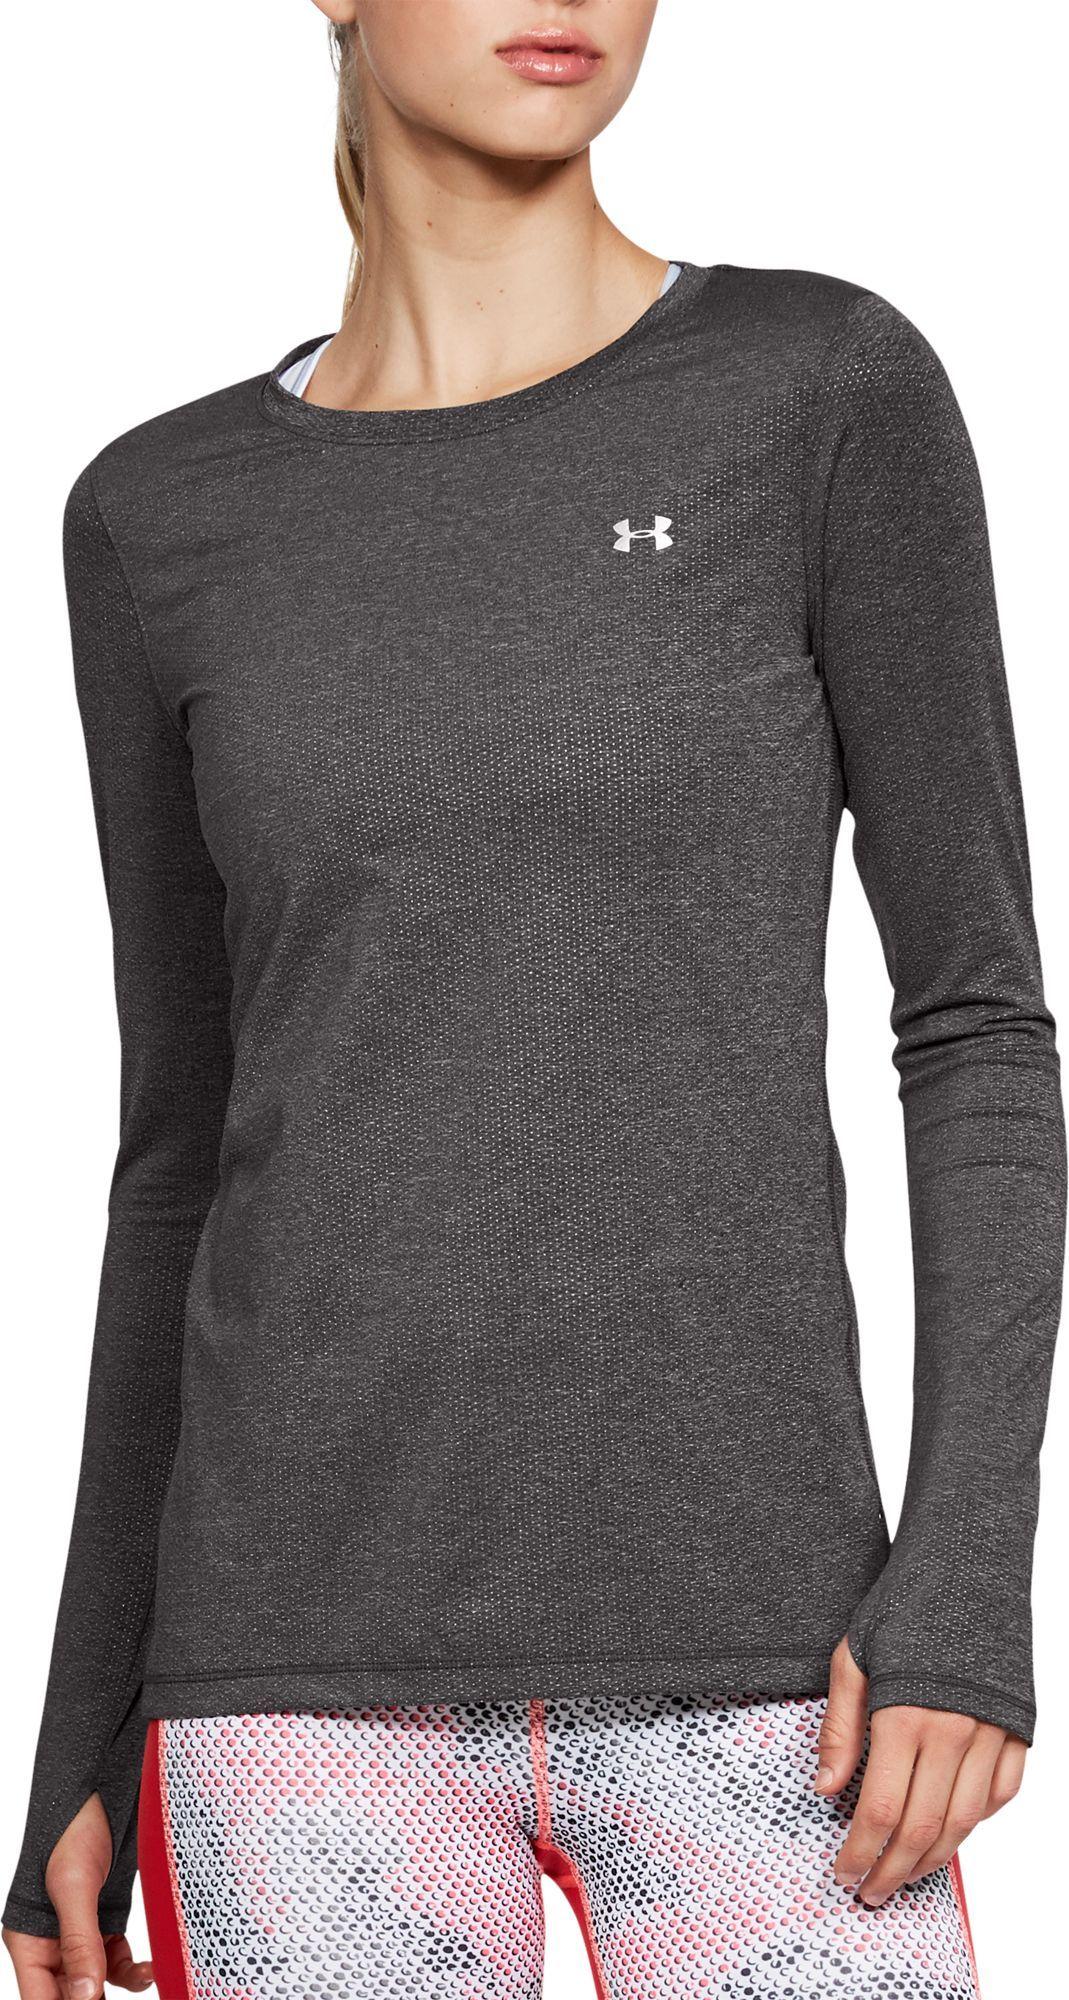 bc2032db5 Under Armour Women's HeatGear Armour Long Sleeve Shirt, Charcoal Heather